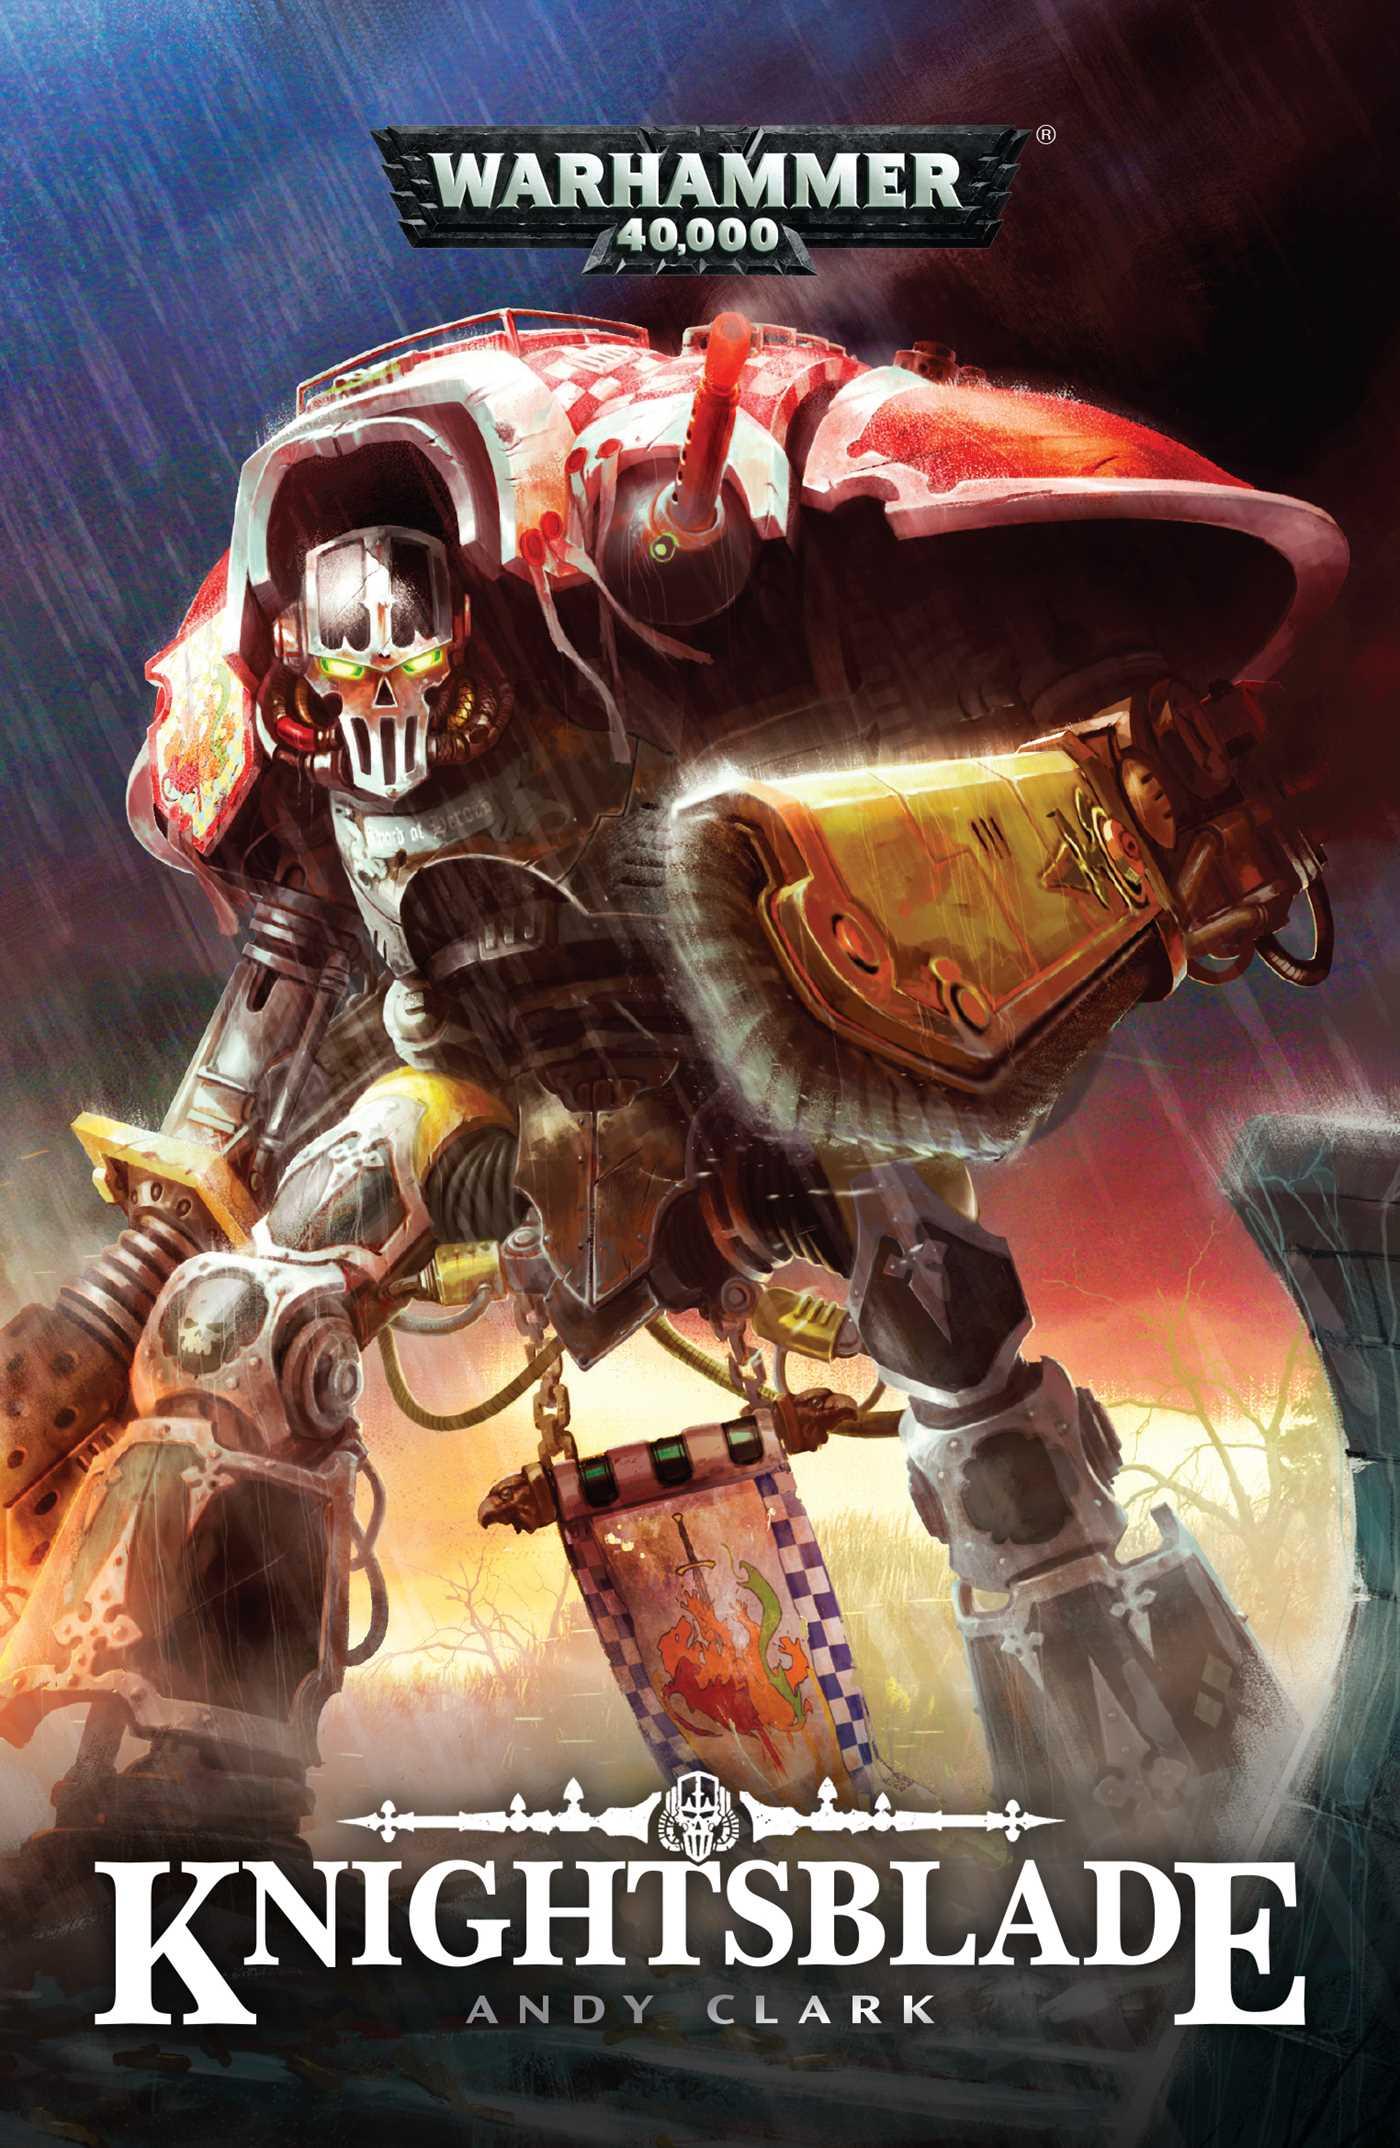 Knightsblade 9781784967543 hr